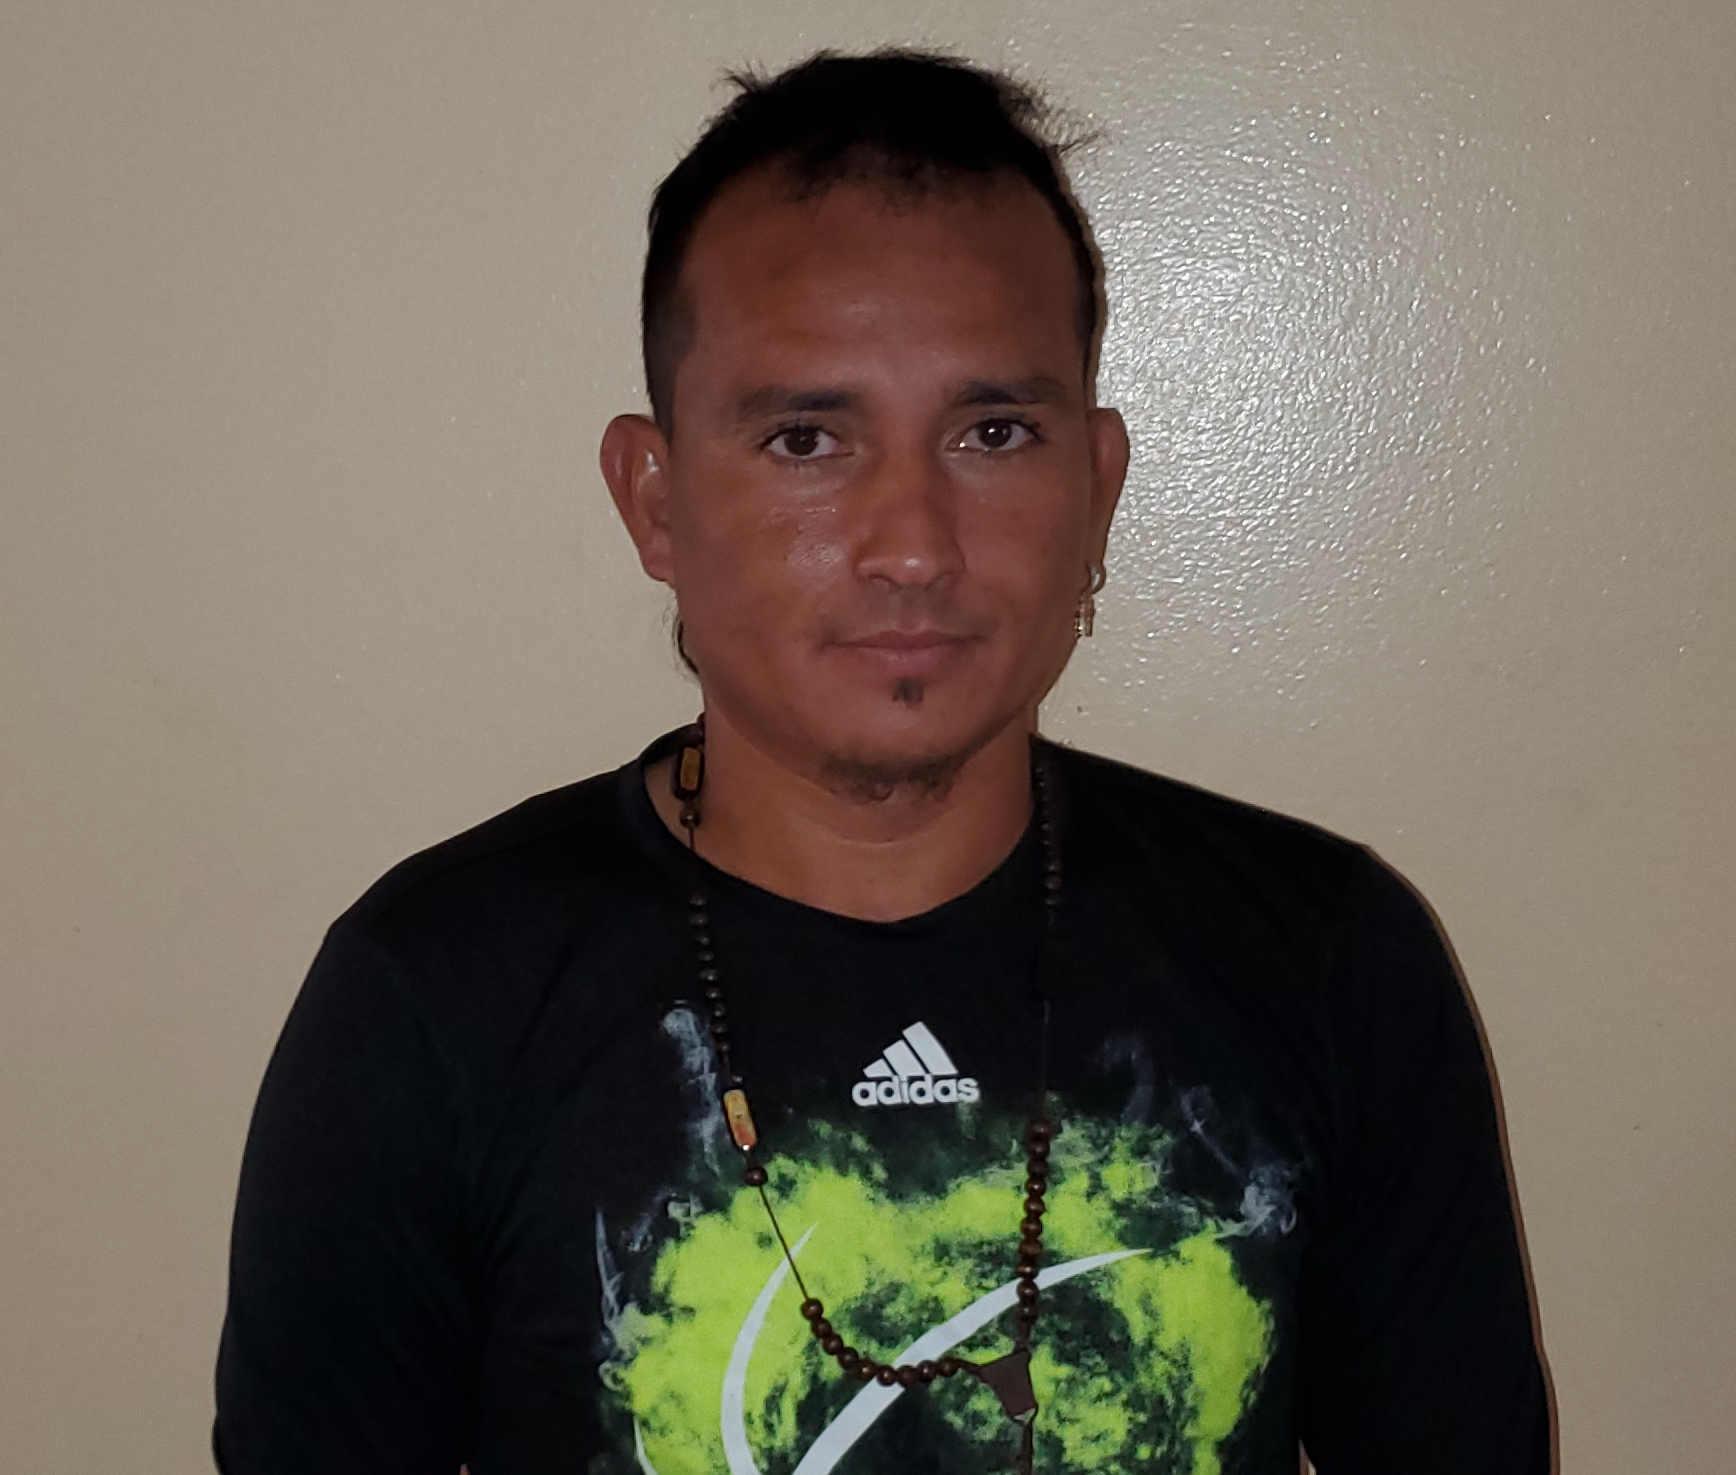 José Adalid